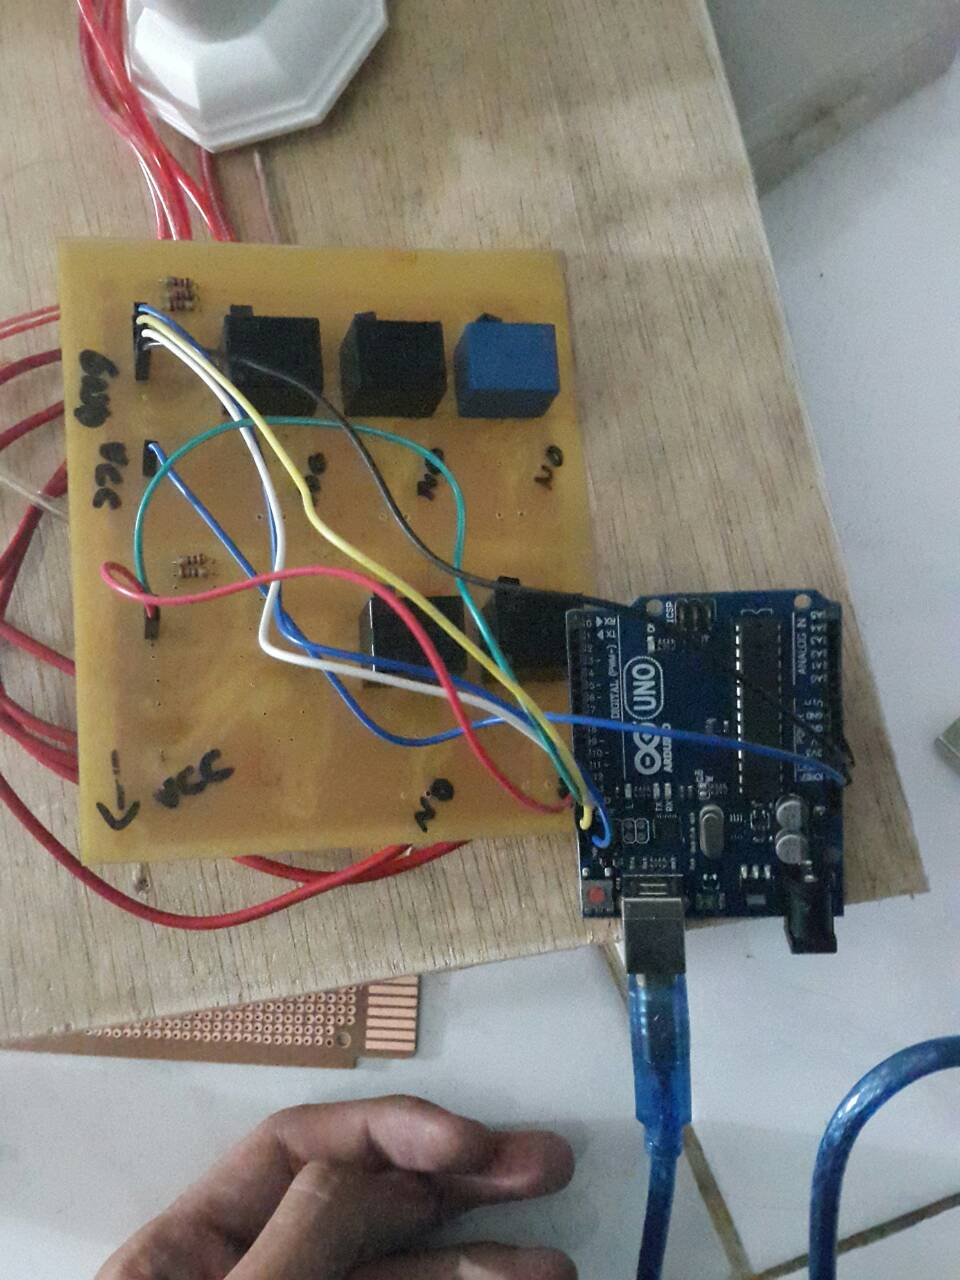 Mengendalikan lampu menggunakan arduino dan relay melalui